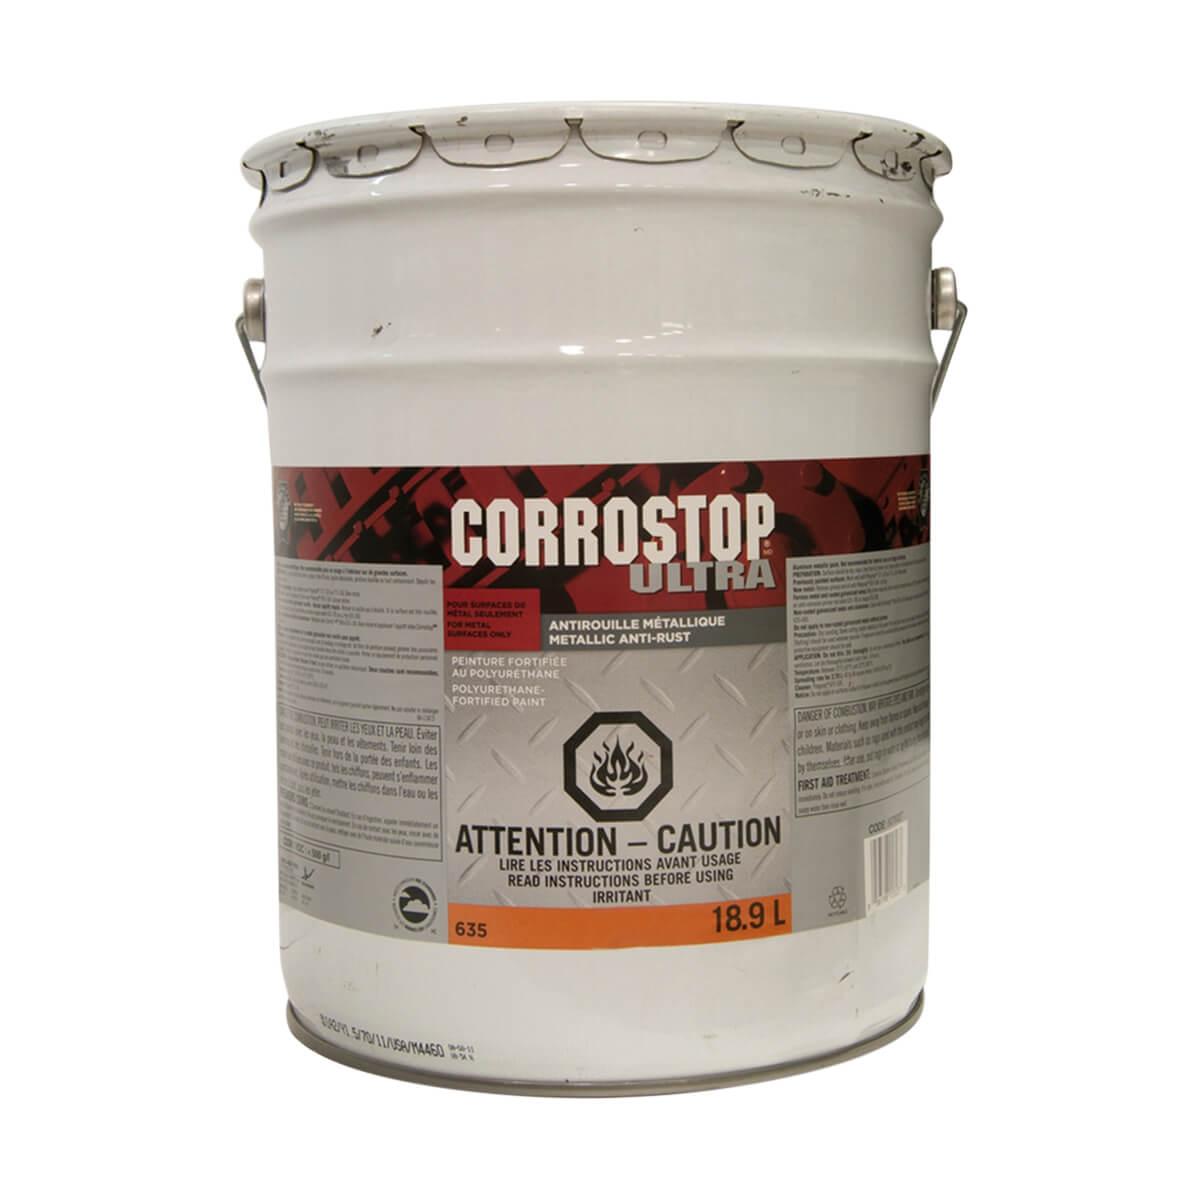 Corrostop - Anti-rust Alkyd Paint 18.9 L